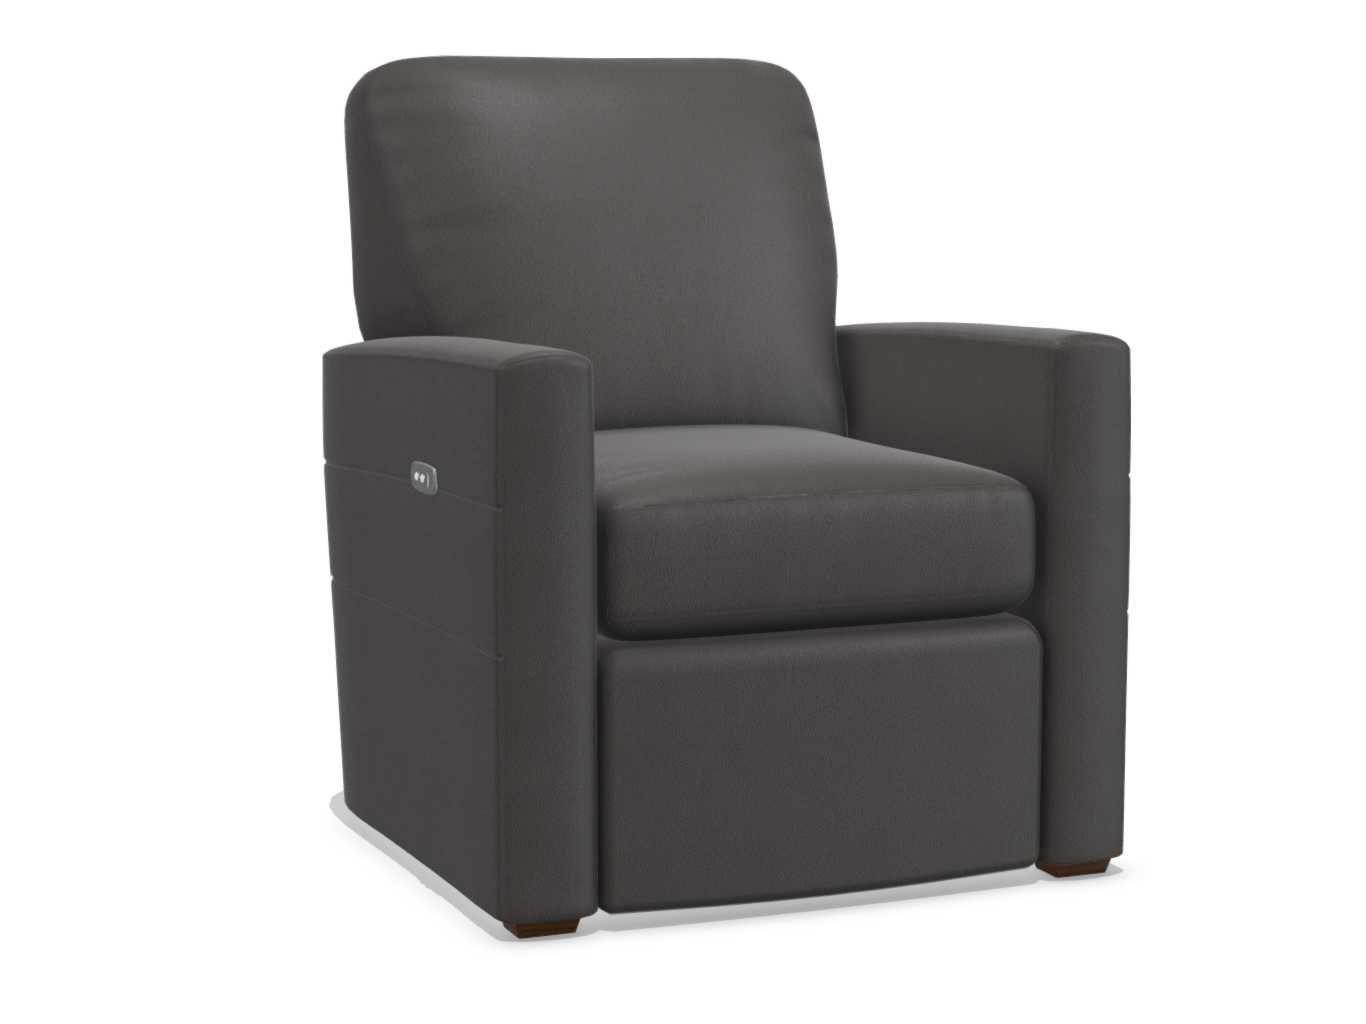 Midtown Low Leg Power Reclining Chair Swivel Recliner Chairs Best Recliner Chair Small Chair For Bedroom #reclining #swivel #chairs #for #living #room